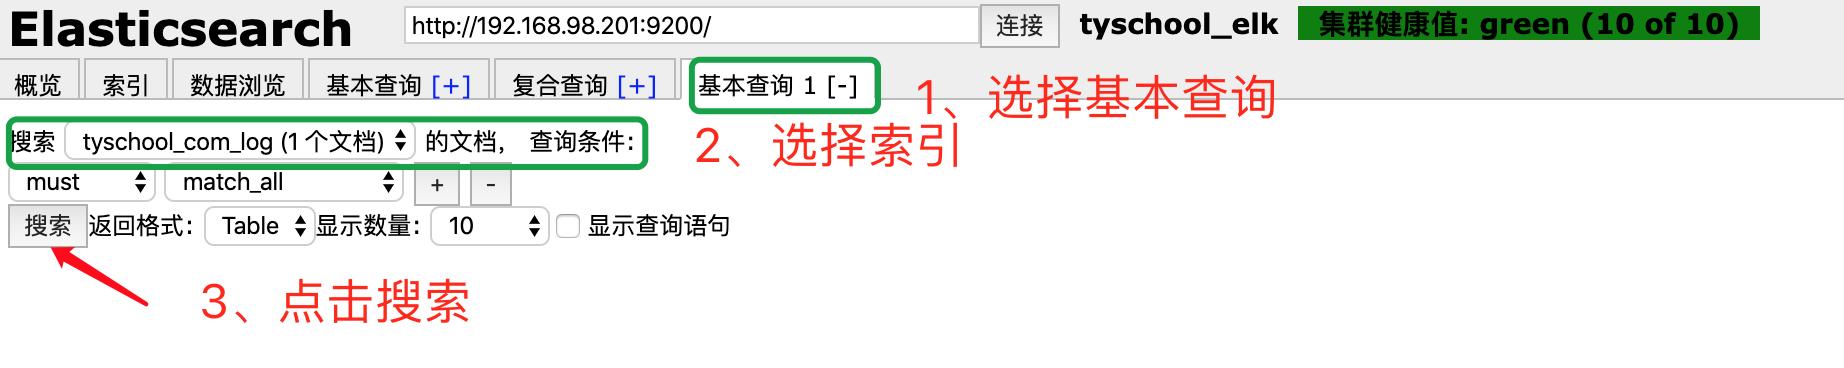 19_eshead_基本查询_查询数据.png